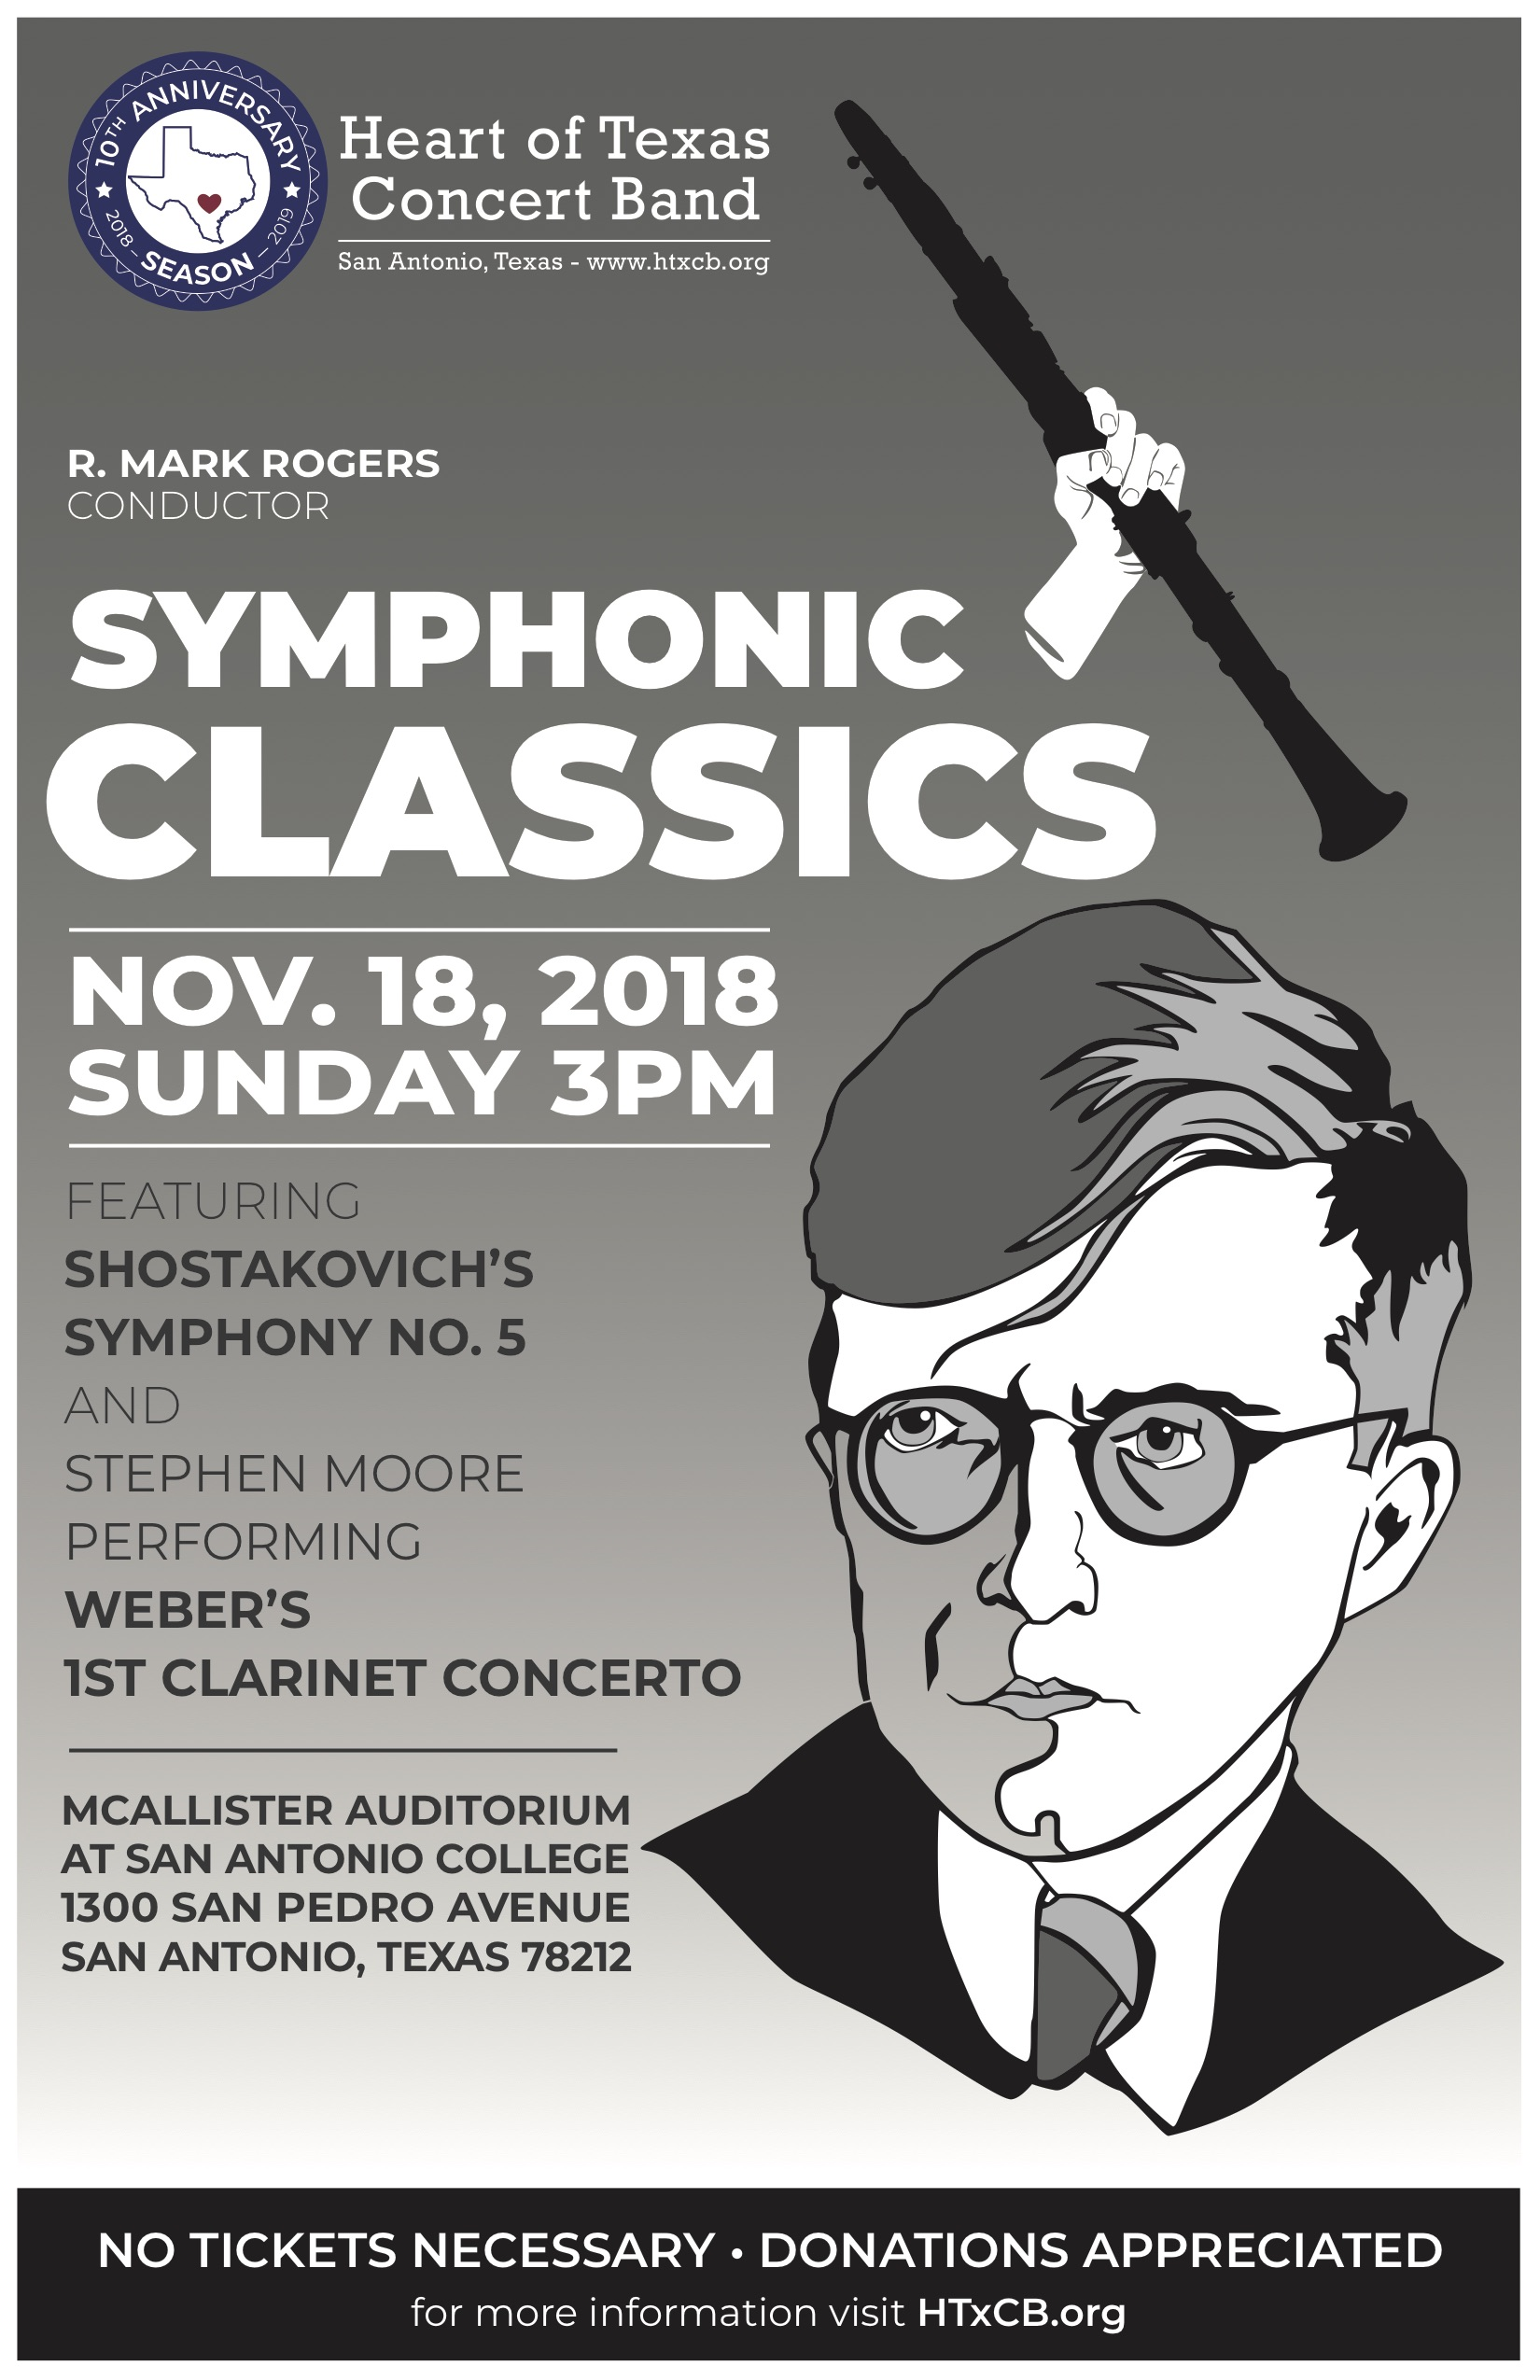 A Night At the Opera - October 7, 2018